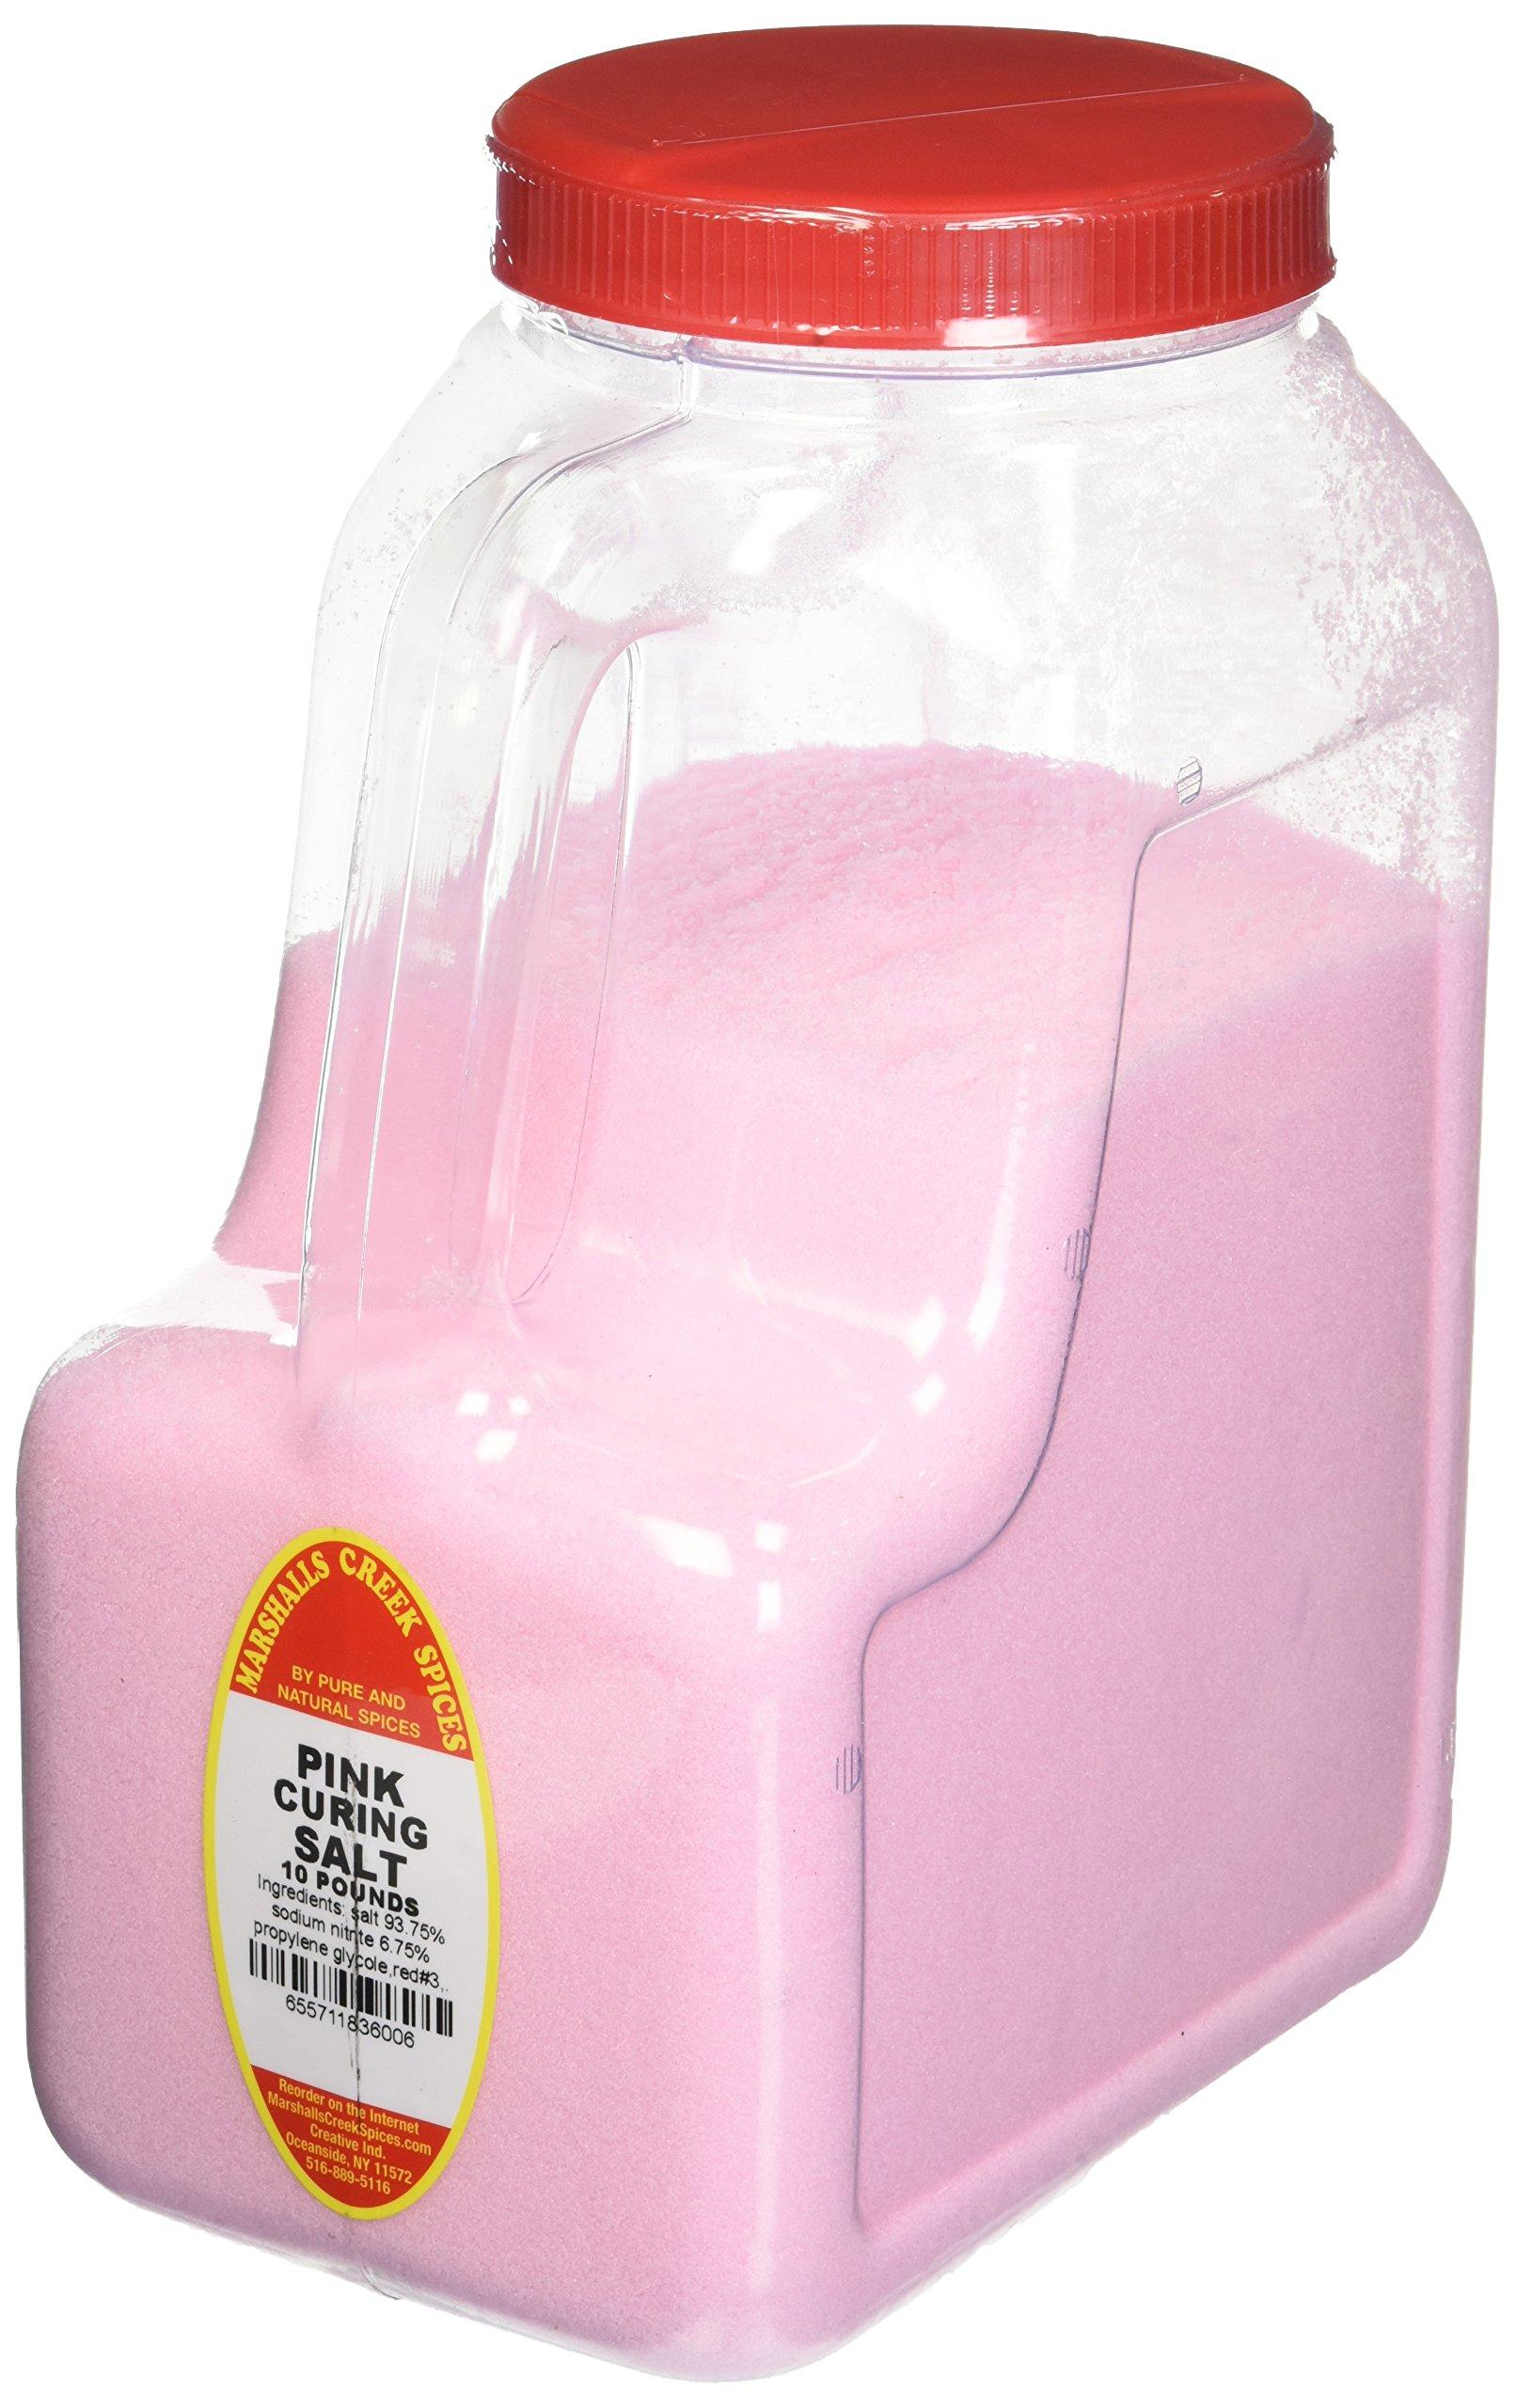 Marshalls Creek Spices Pink Curing Salt, 10 Pound